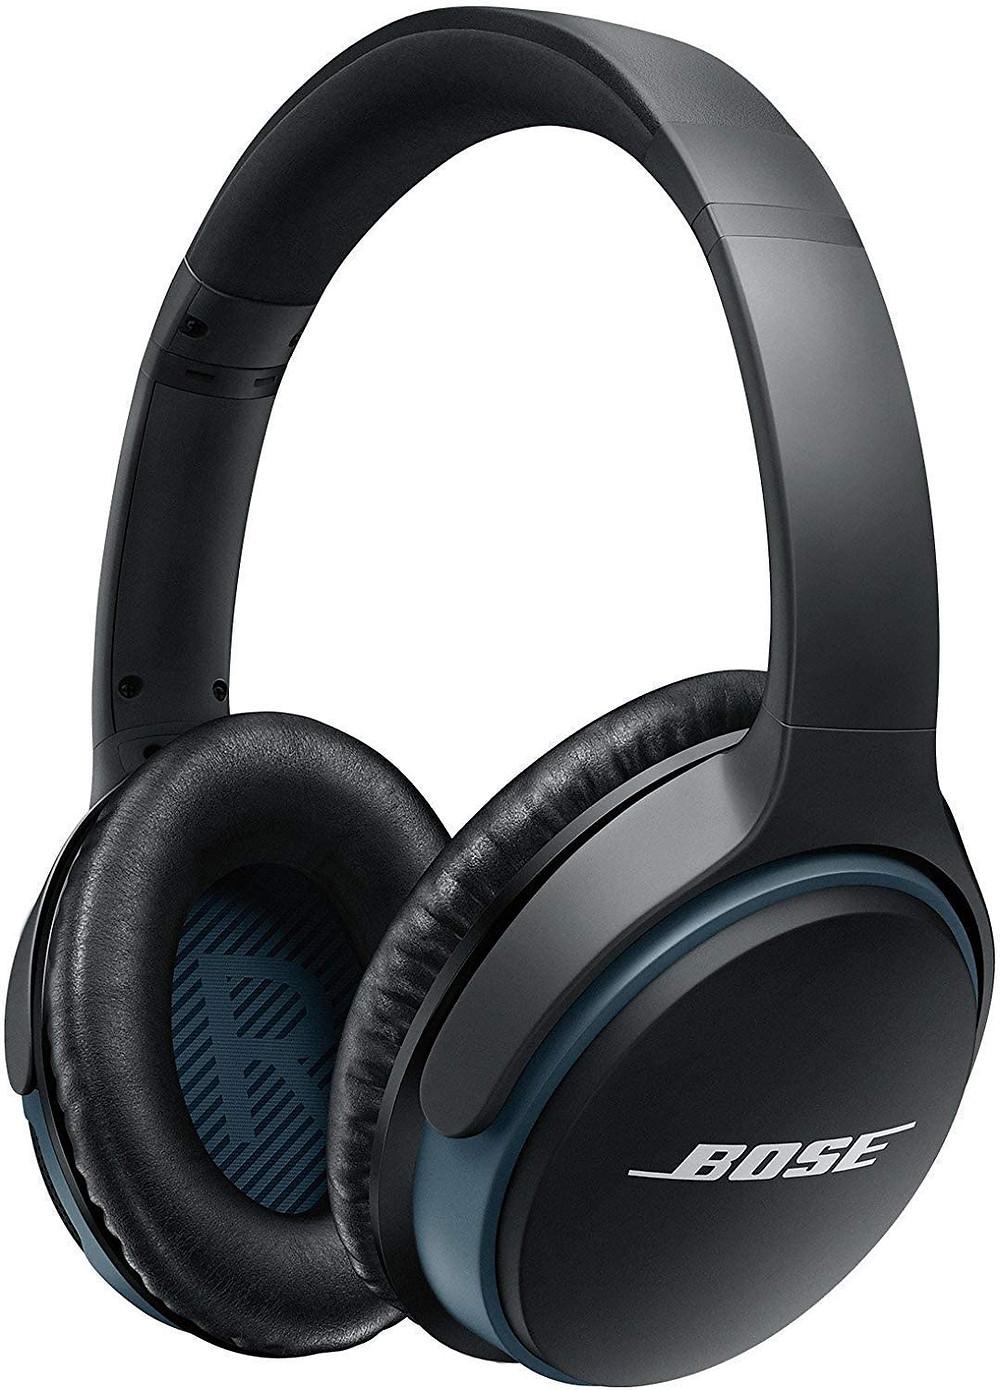 ose SoundLink Around Ear Wireless Headphones II